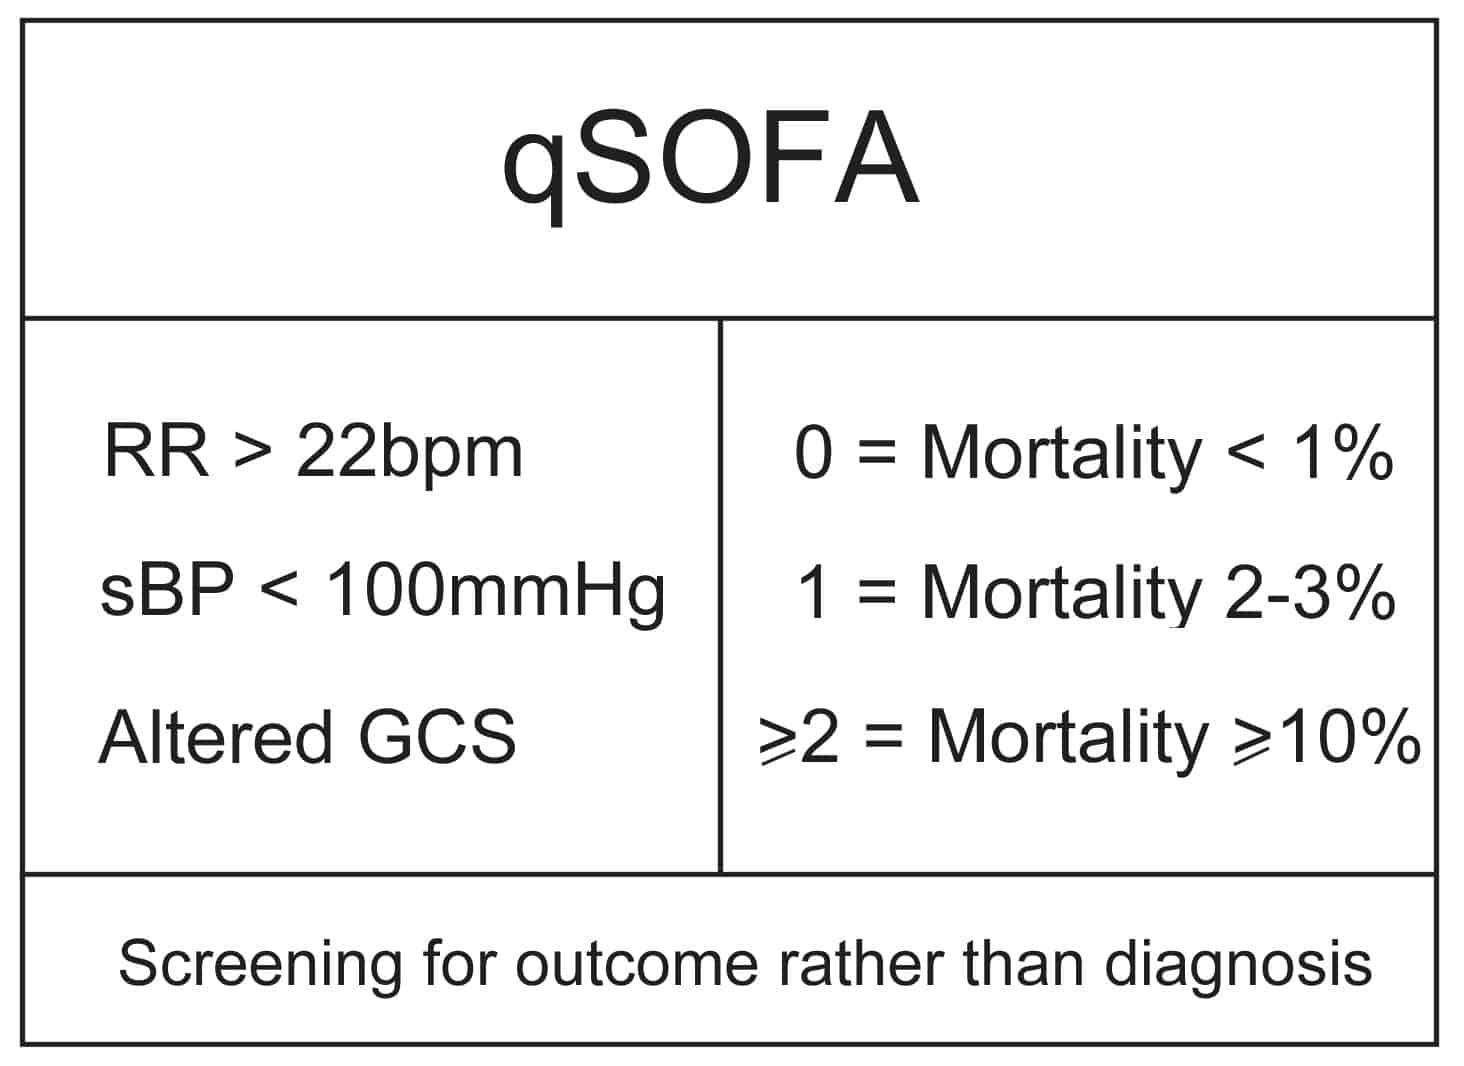 100 Sofa Sepsis Pdf 2016 Sofa And Mortality  : qSOFAcomponents from meganhofmann.com size 1464 x 1066 jpeg 111kB